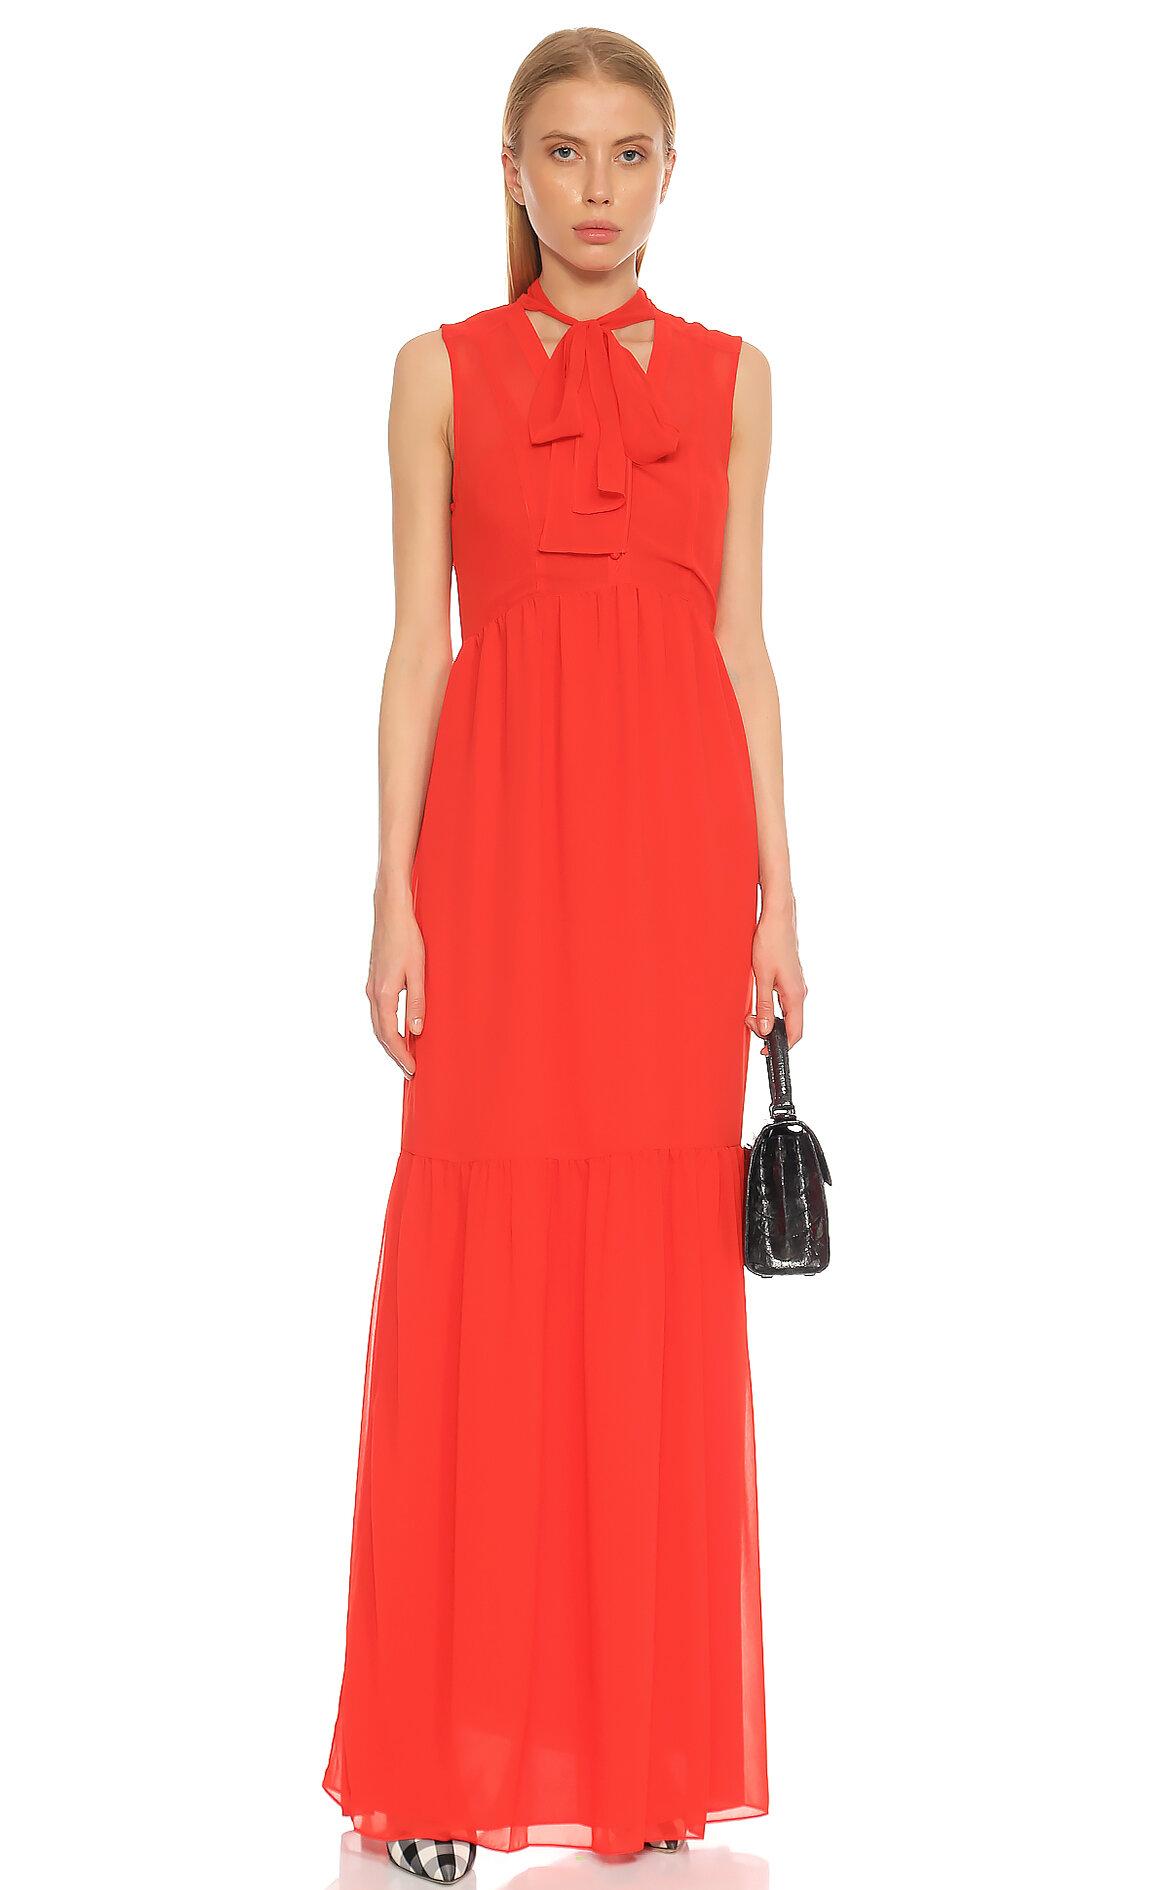 Juicy Couture-Juicy Couture Şal yaka Kırmızı Elbise